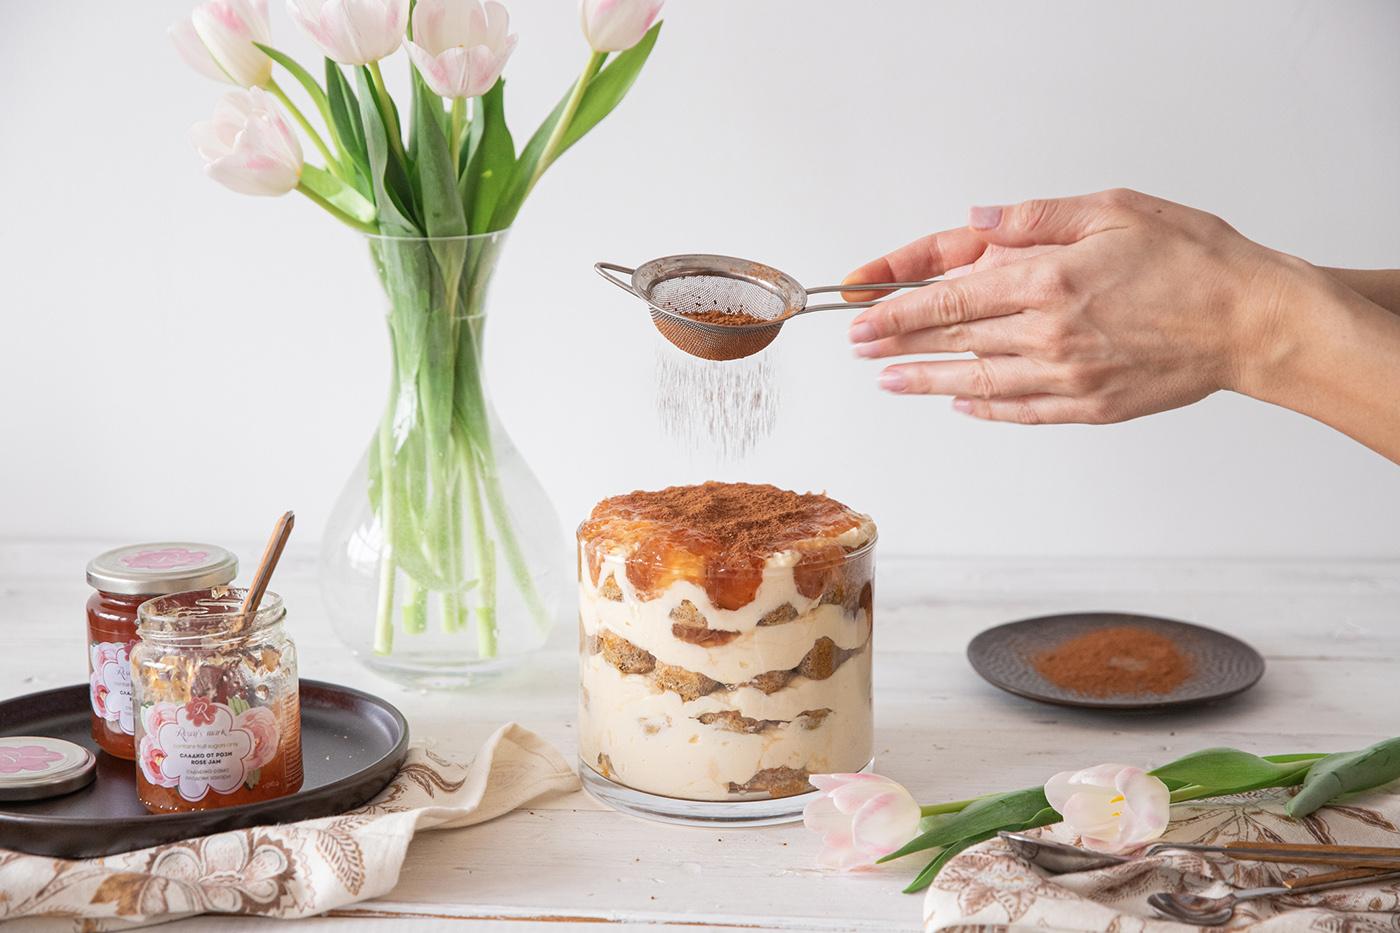 Rose-flavoured tiramisu